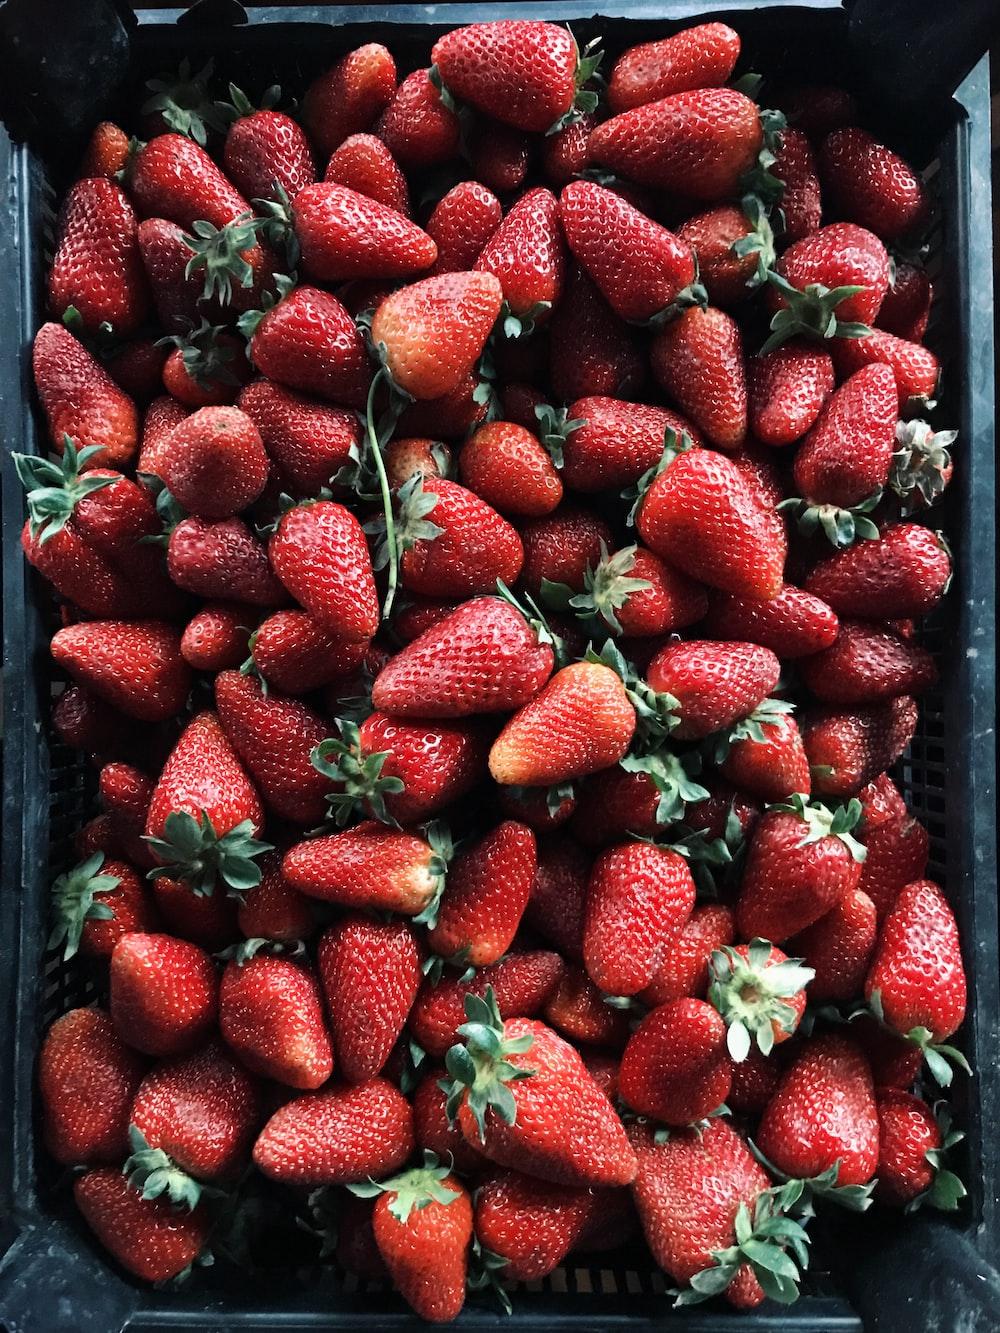 strawberry lot on black plastic crate